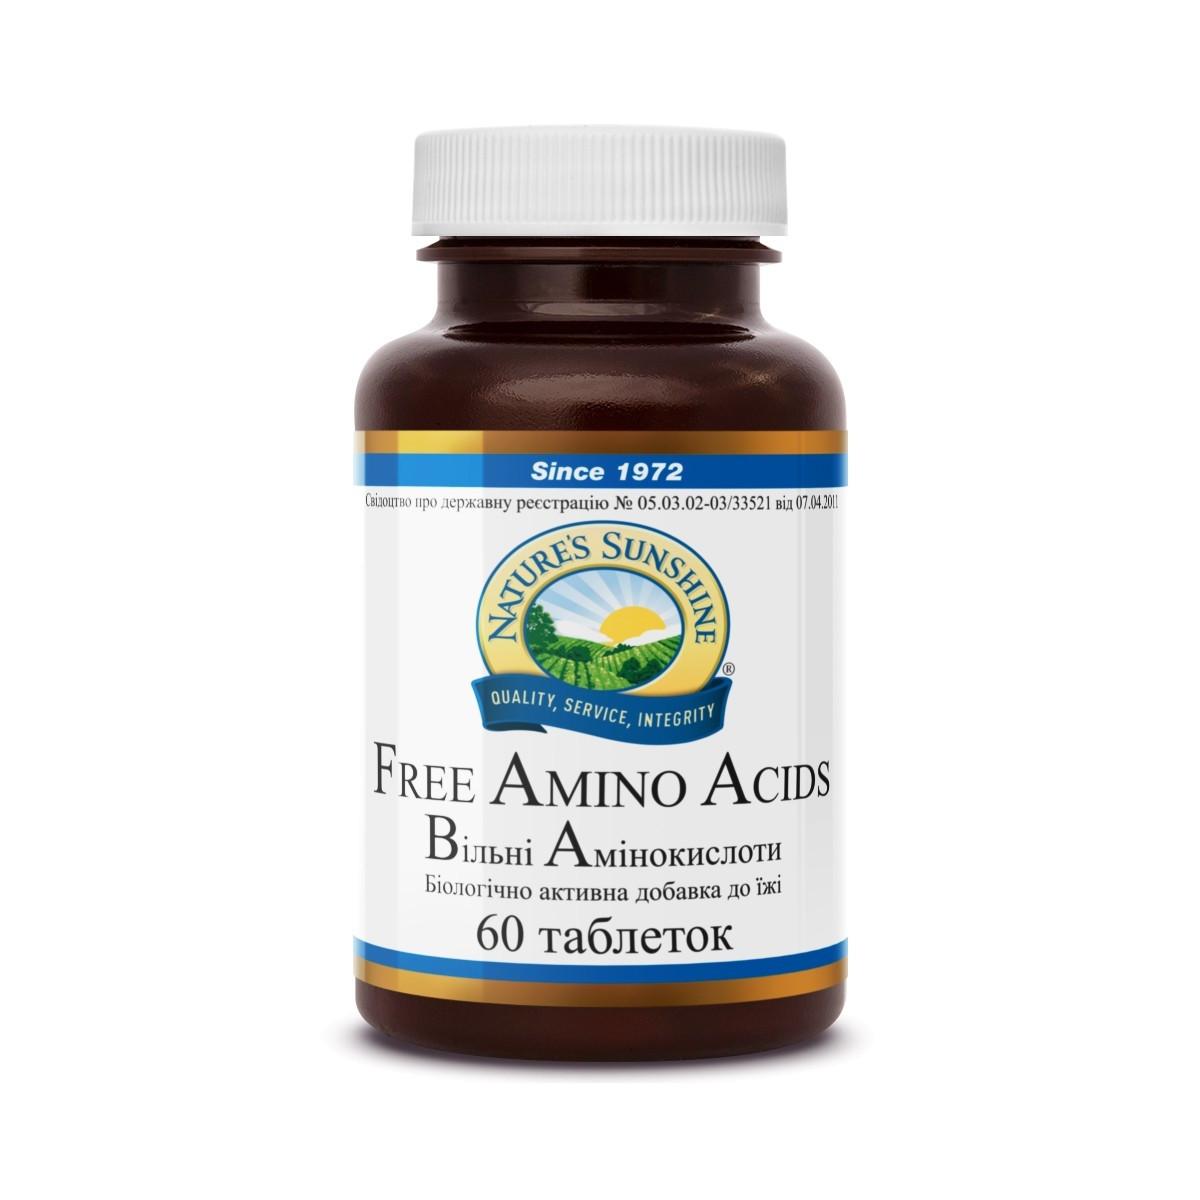 Свободные Аминокислоты. Free Amino Acids бад НСП.